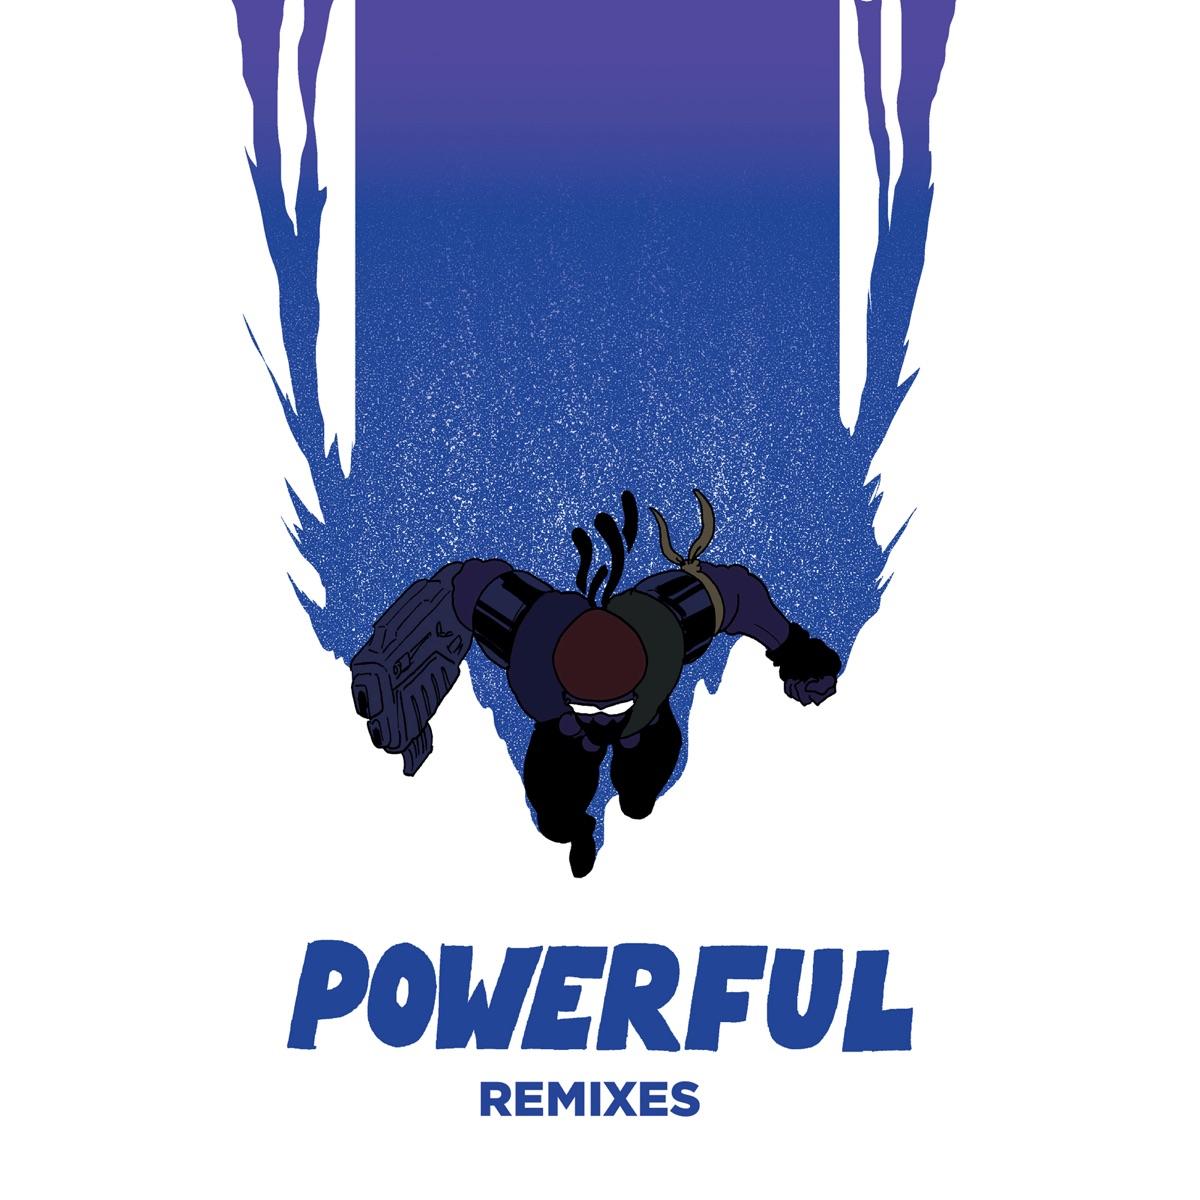 Powerful feat Ellie Goulding  Tarrus Riley Remixes - EP Major Lazer CD cover